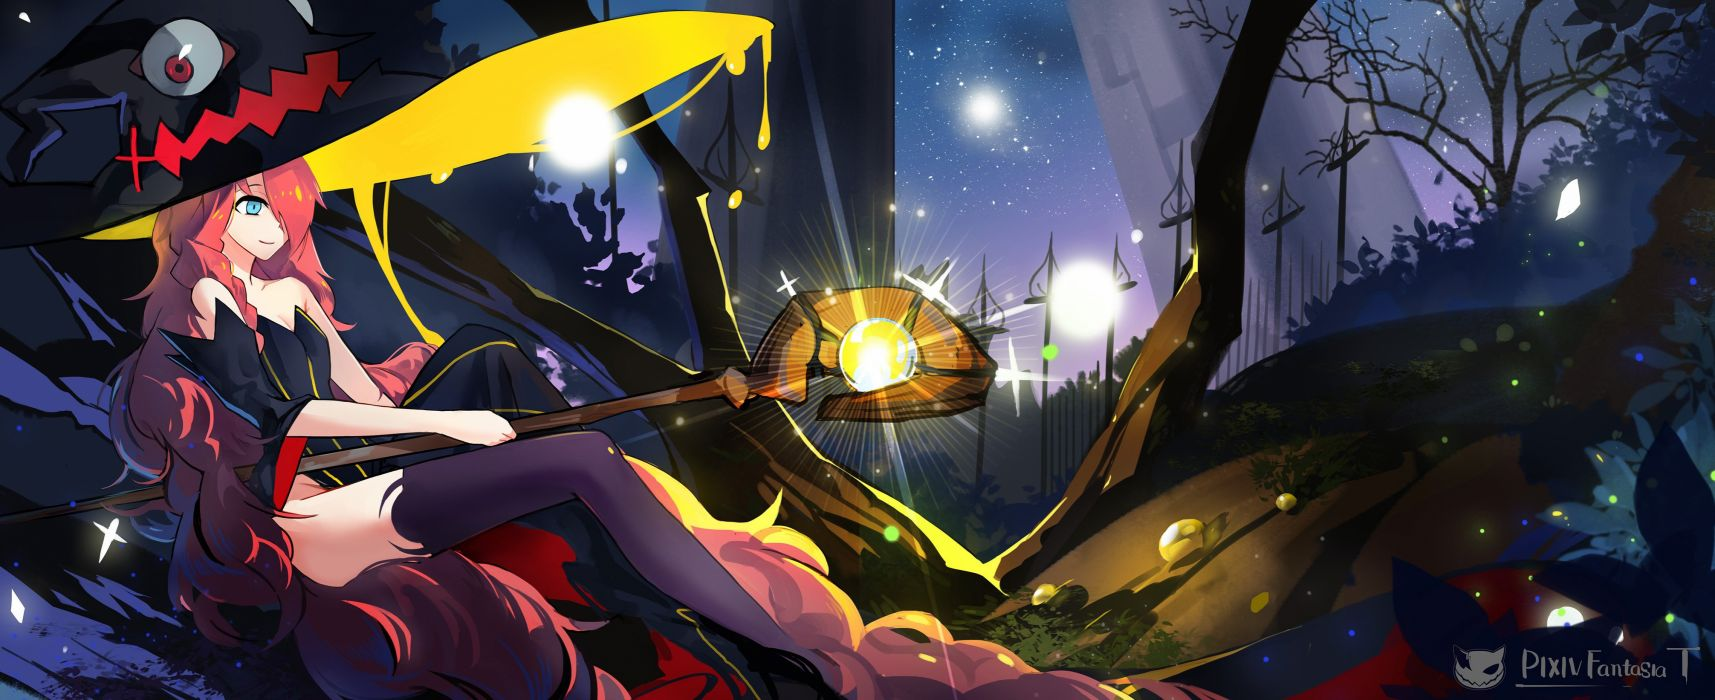 blue eyes hat long hair magic pixiv fantasia red hair staff stars thighhighs tsubasa19900920 witch hat wallpaper